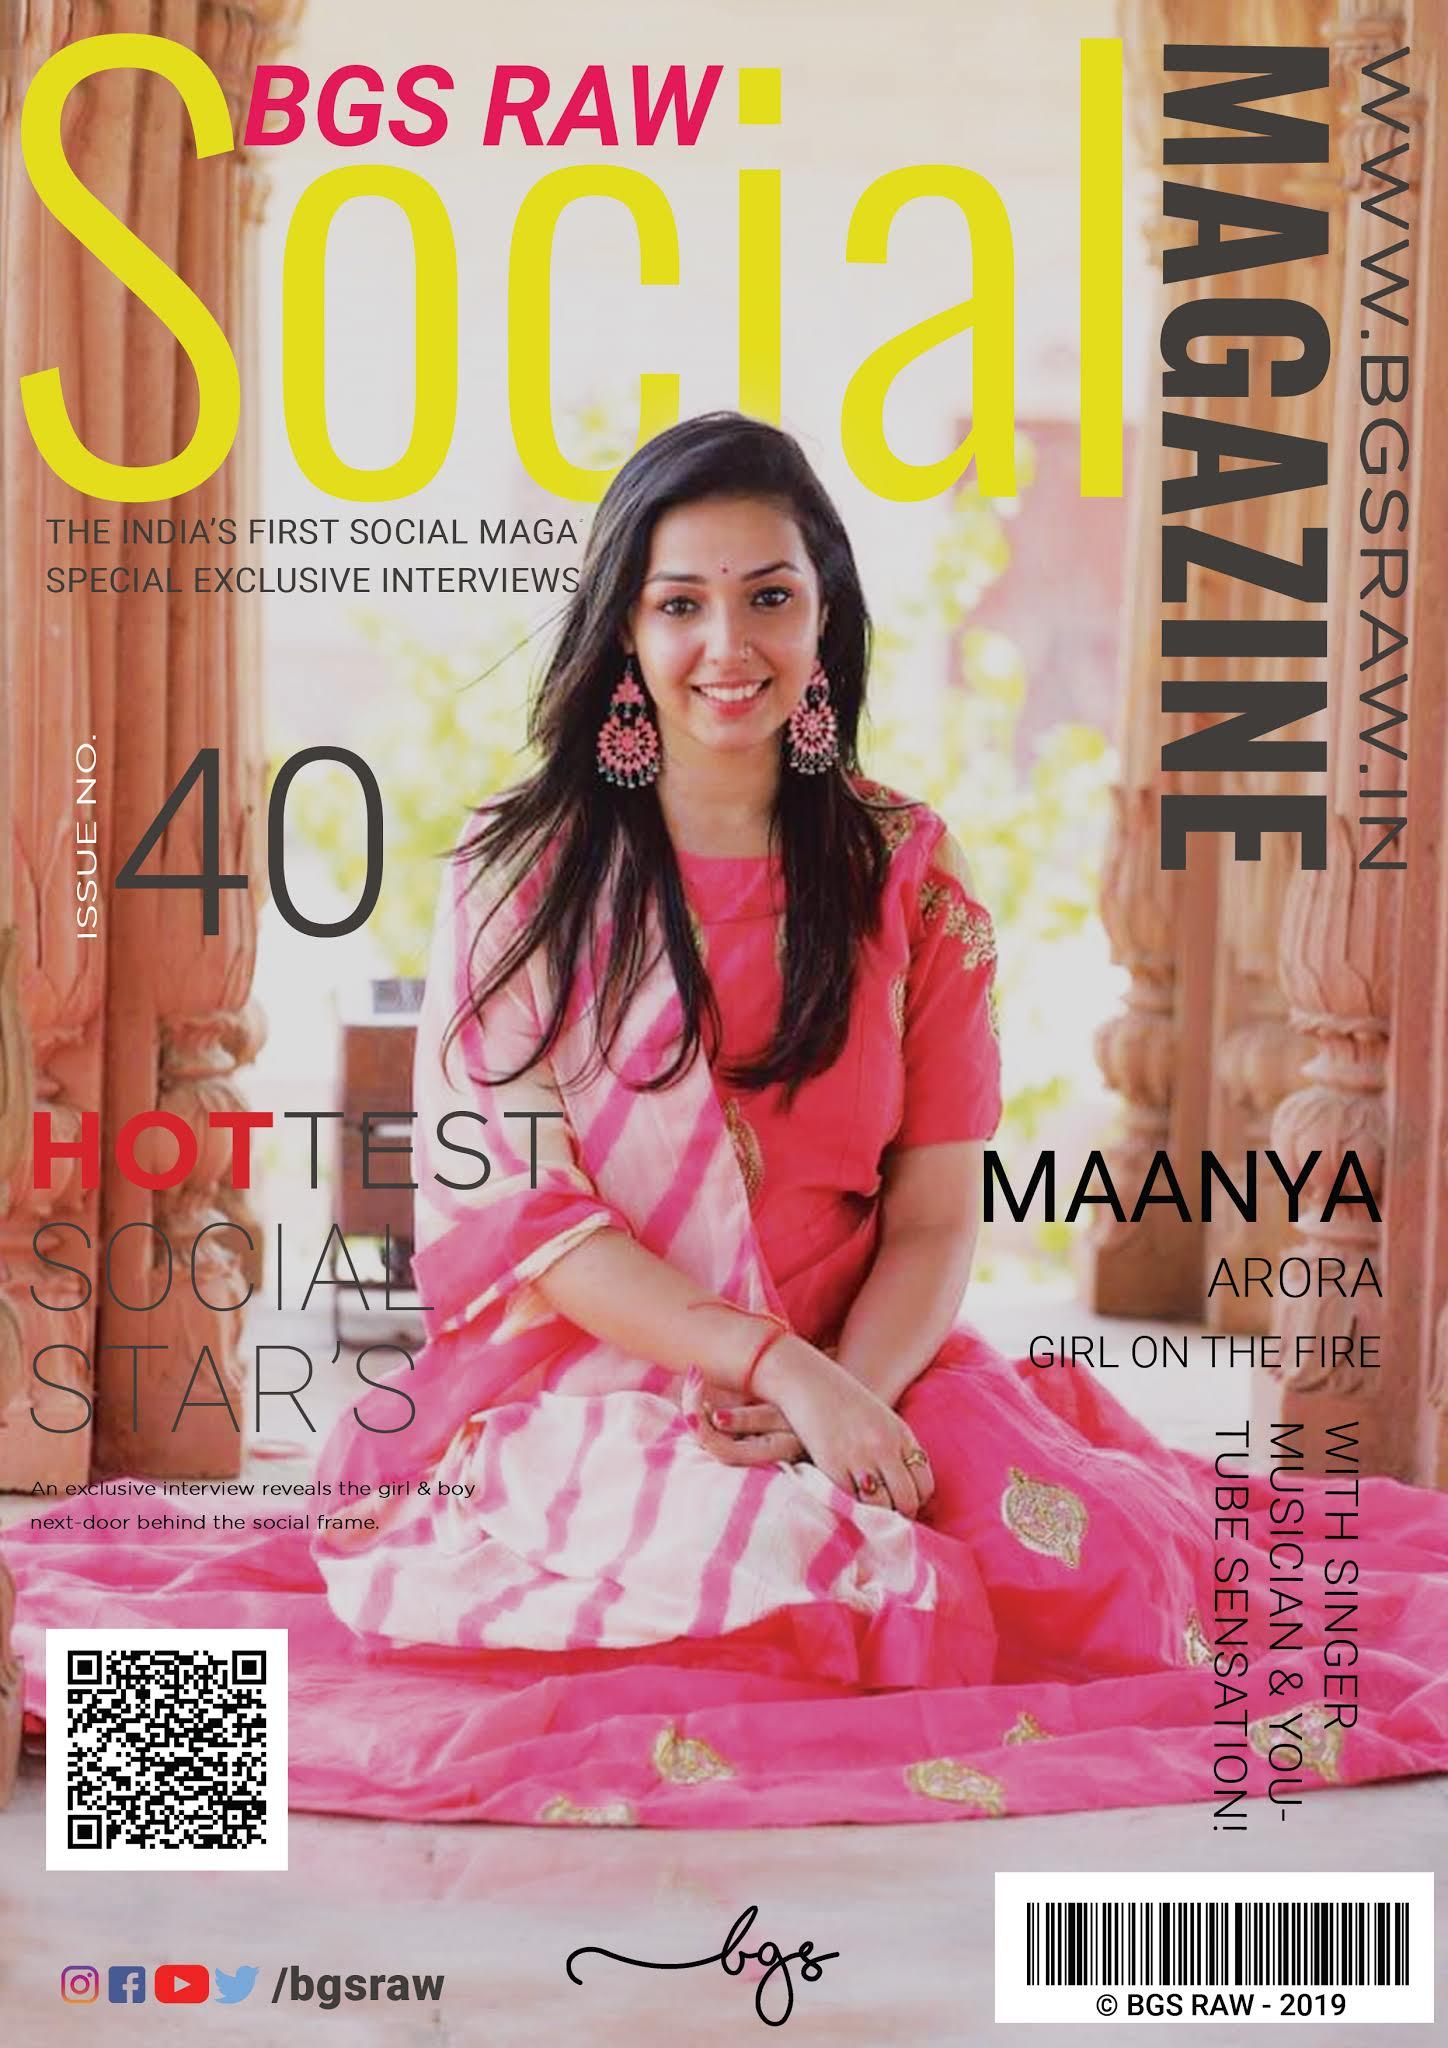 Maanya Arora Inspiration story on Bgs Raw, Maanya is a singer, musician, youtuber, Youtube sensational singer, youtube stars india,